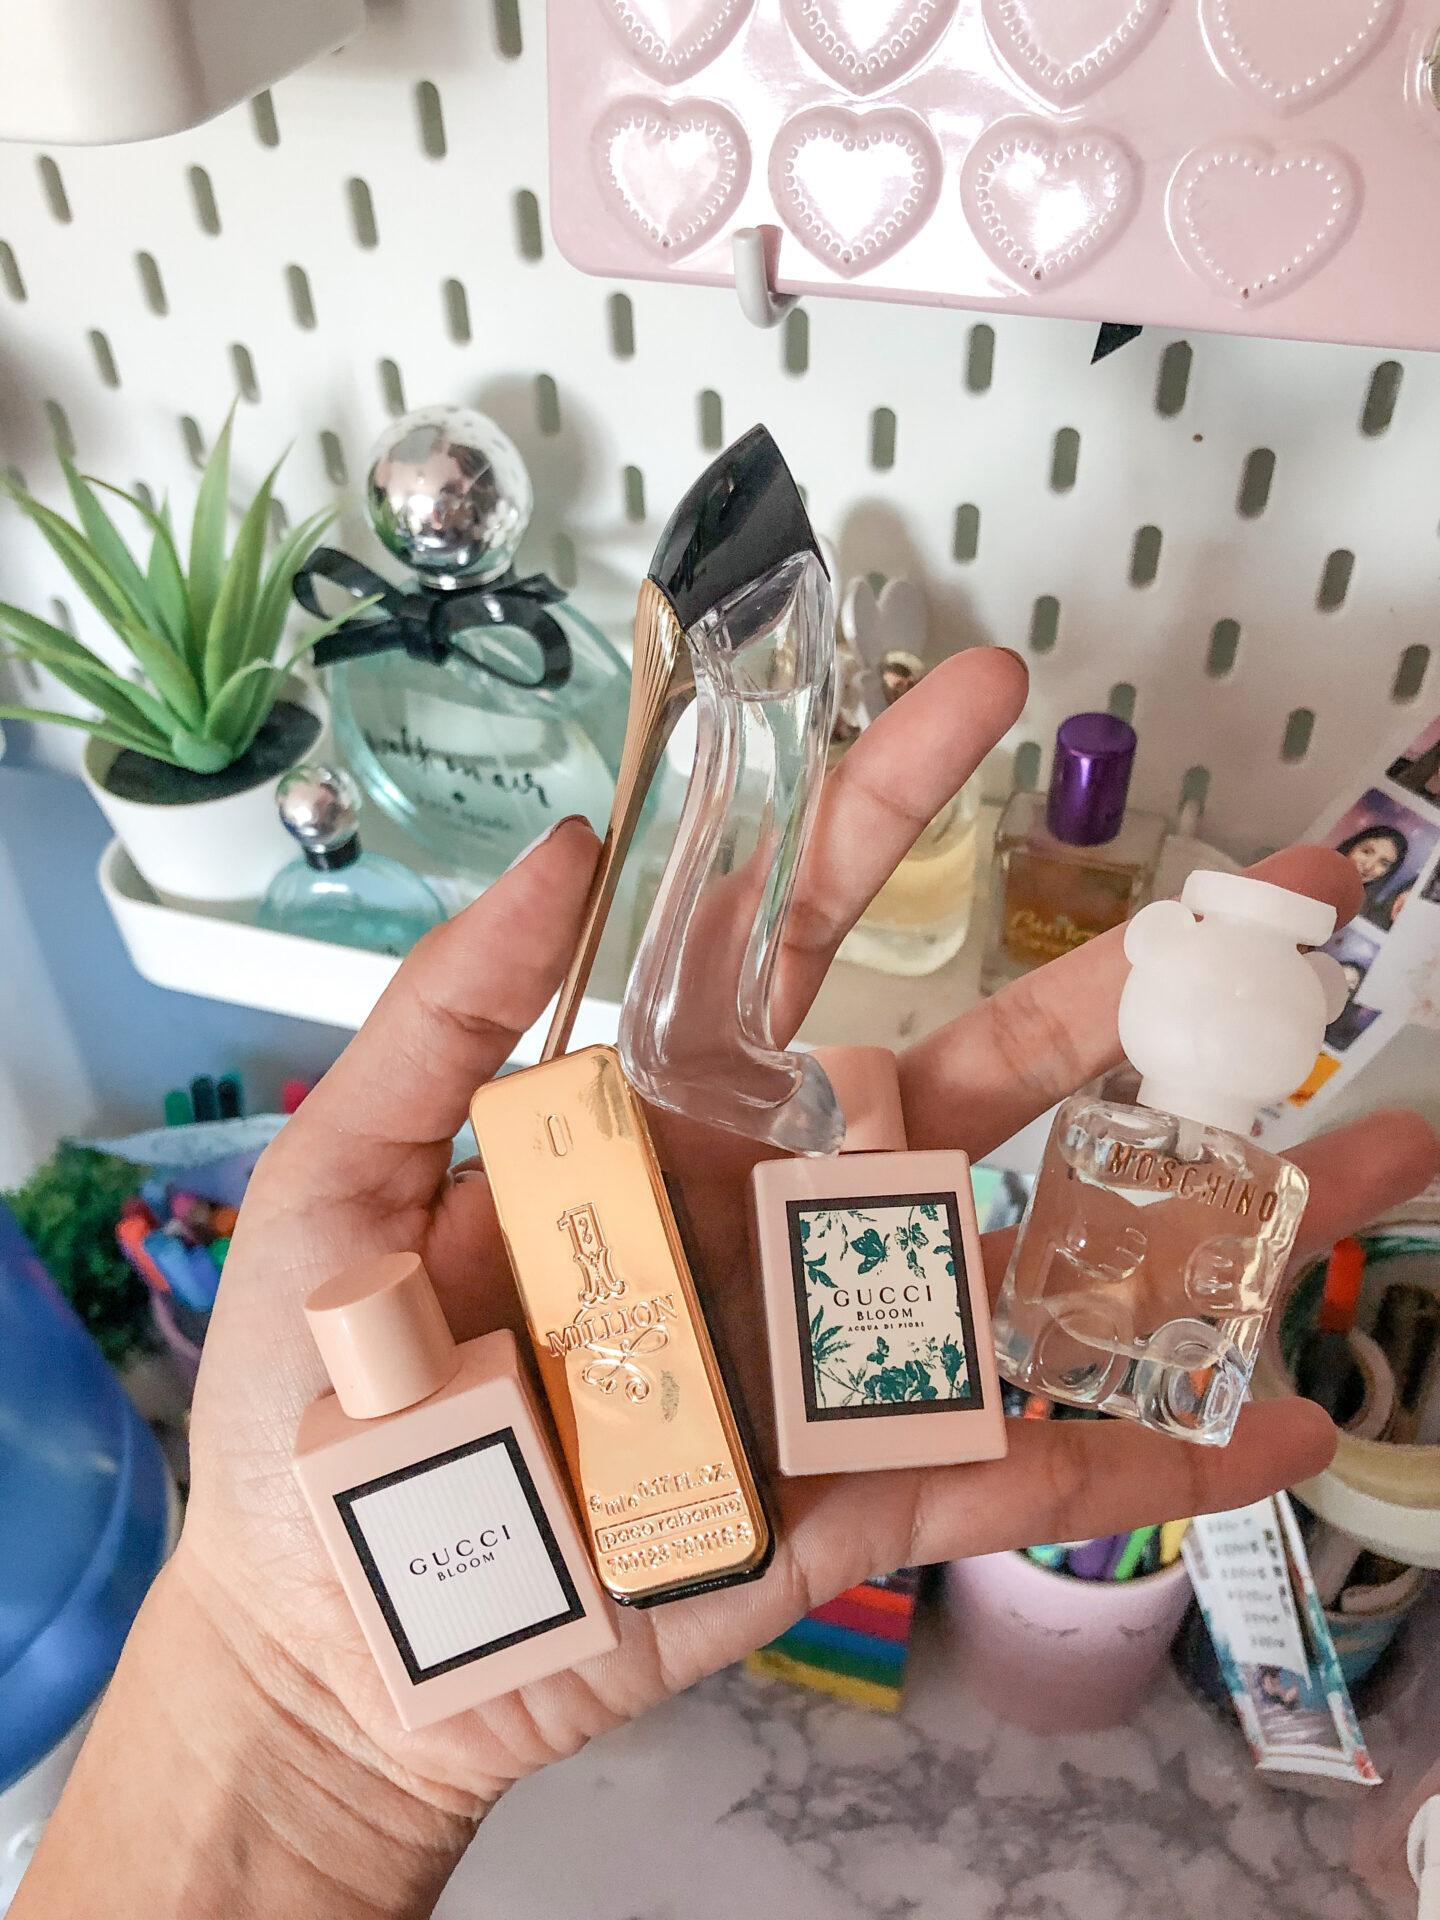 Mis perfumes miniatura